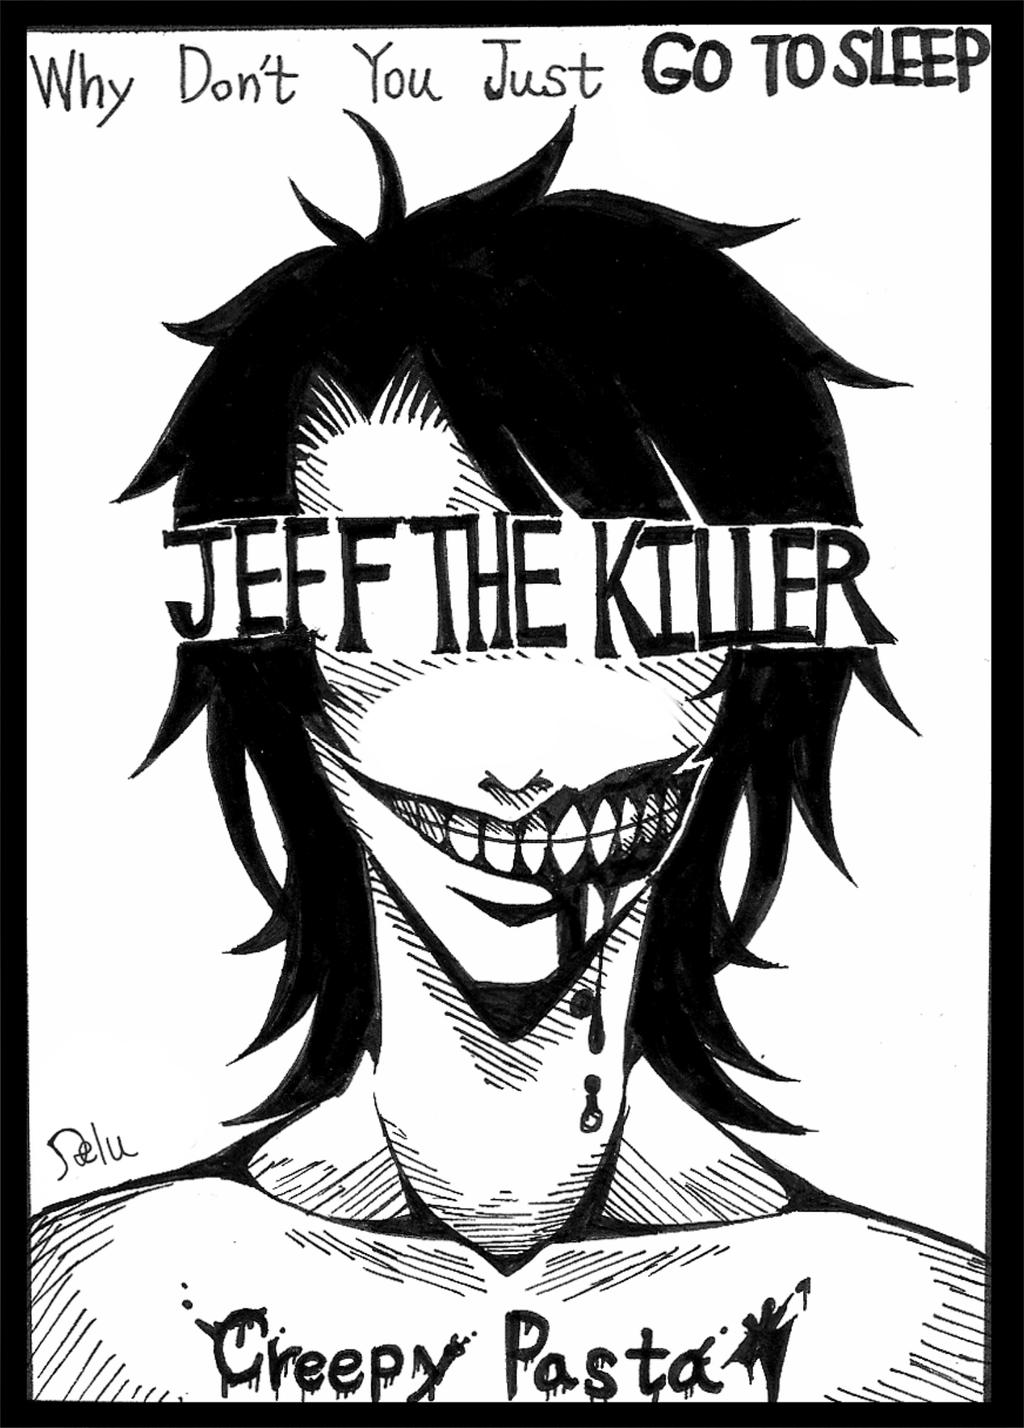 Jeff the killer by DeluCat